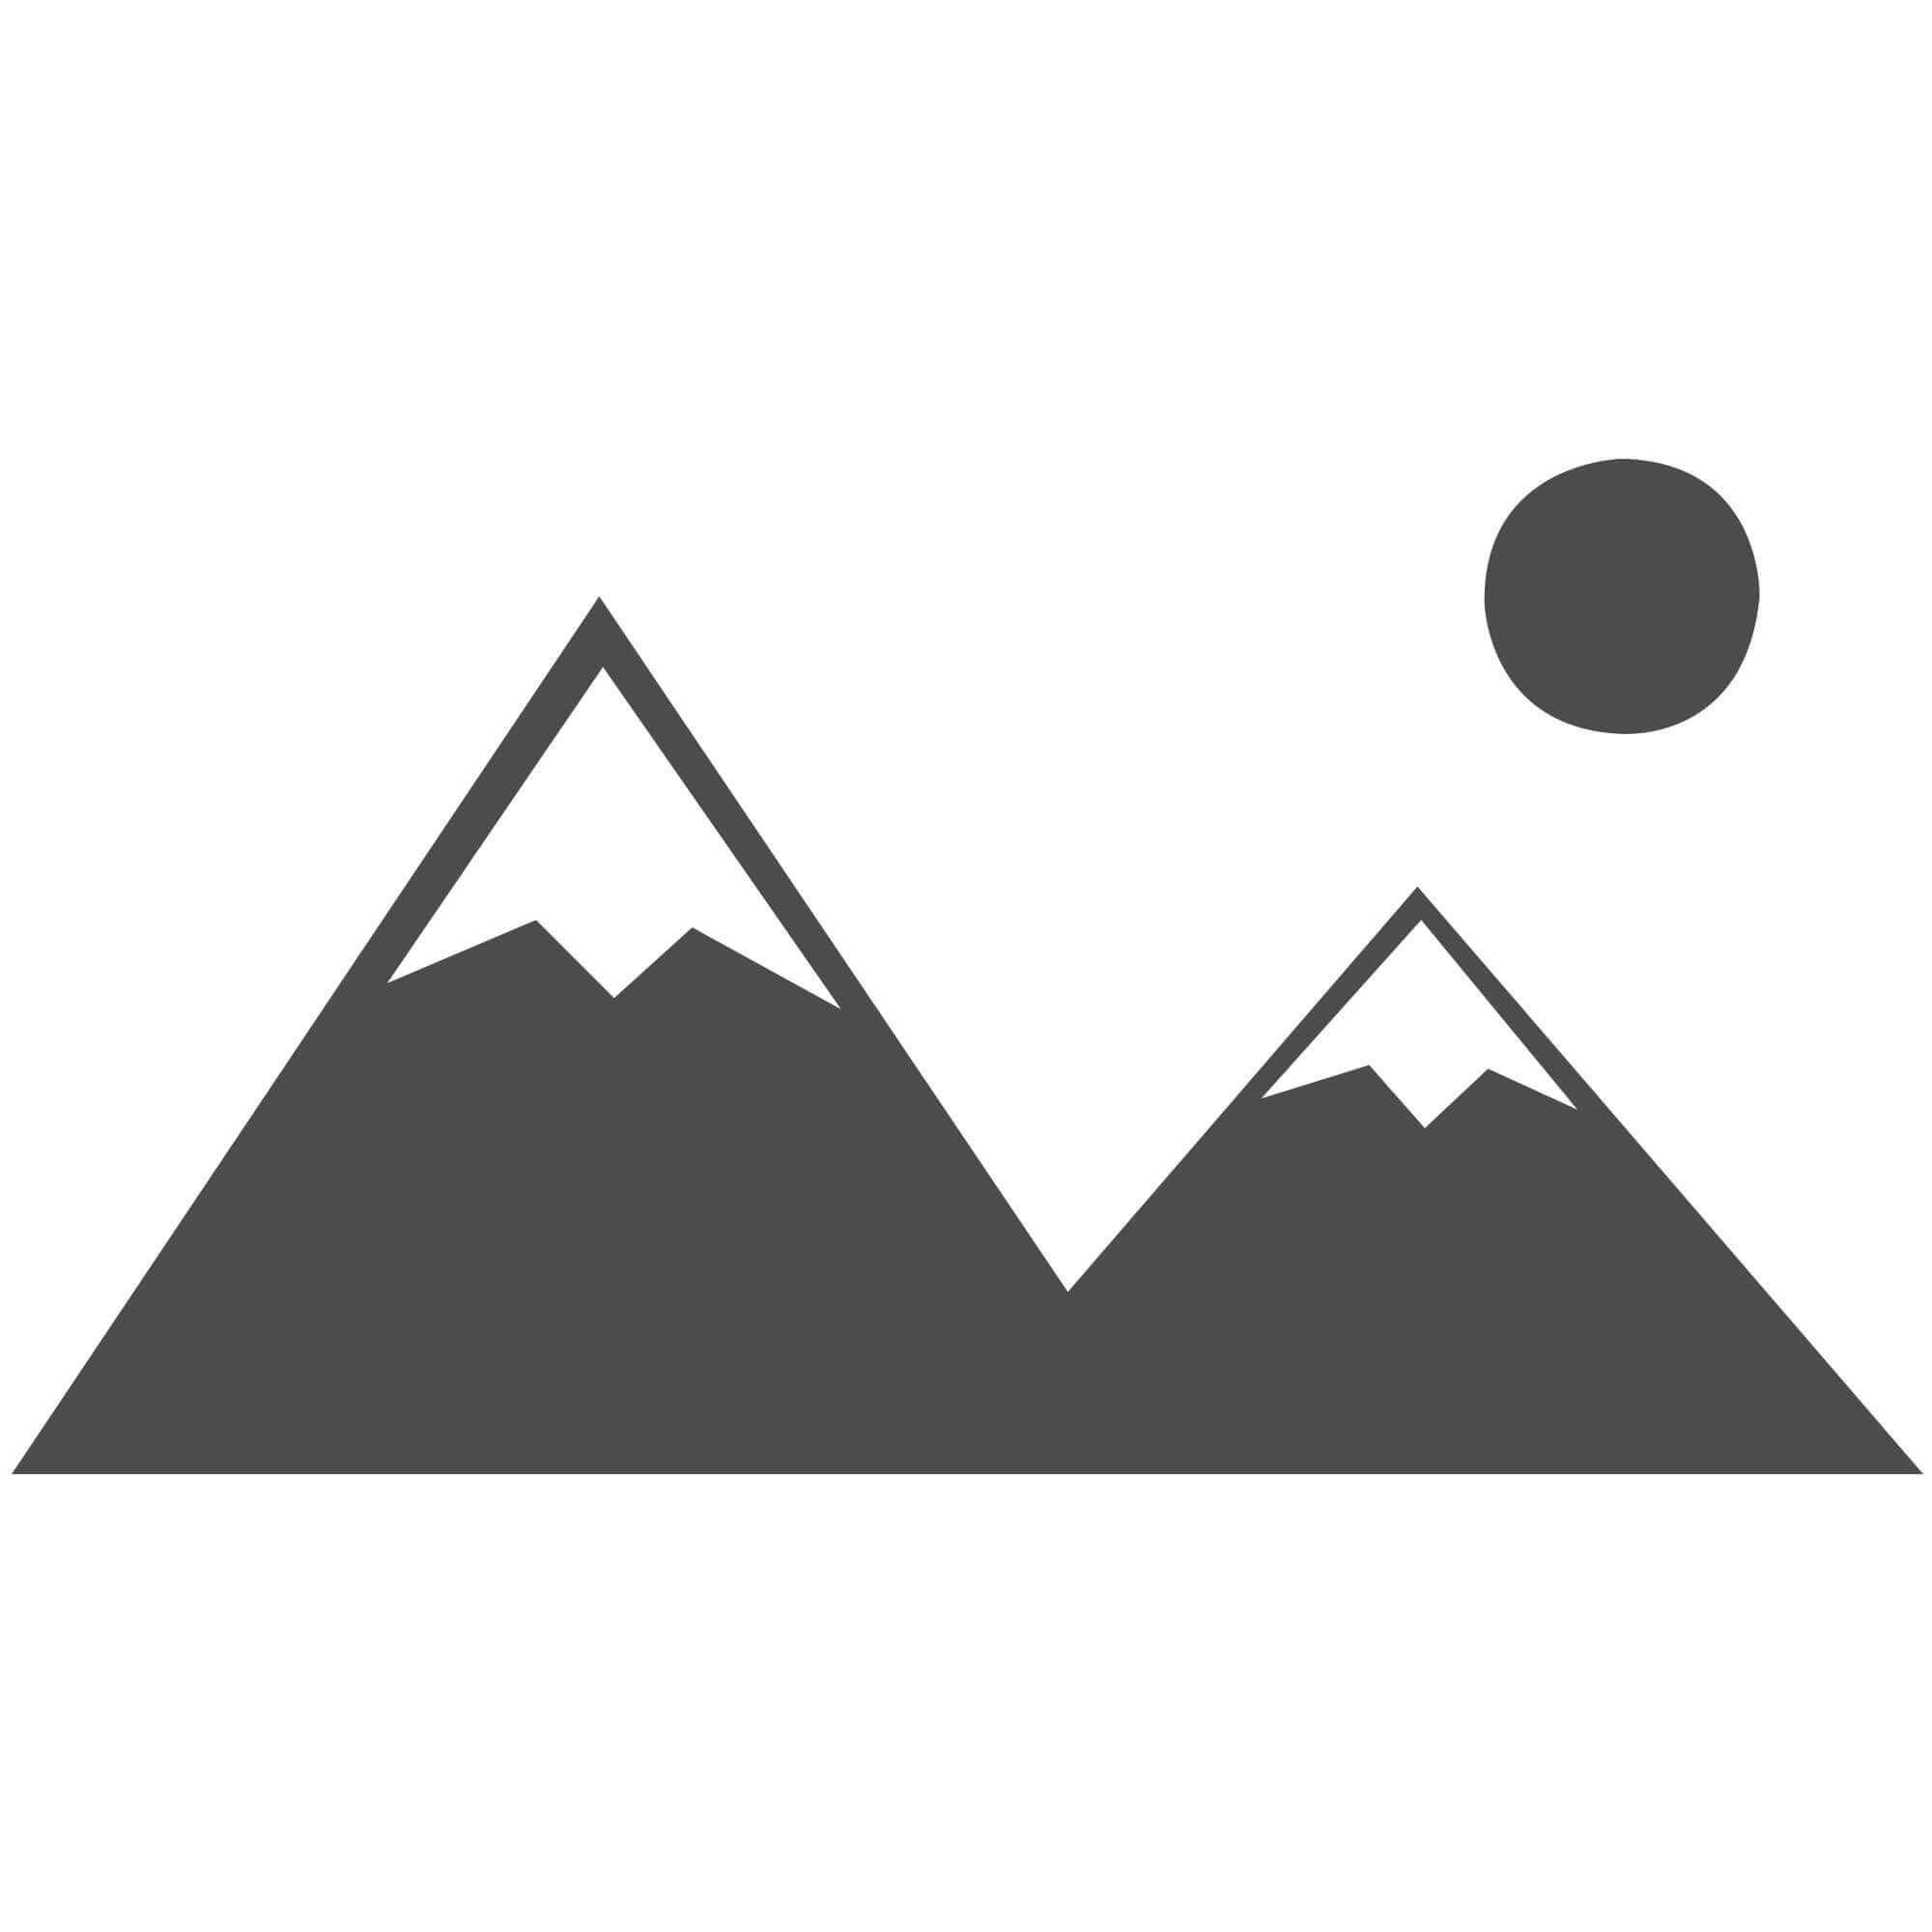 Griot Stripe Rug - Kalimba - KI804 Clove-122 x 183 cm (4' x 6')